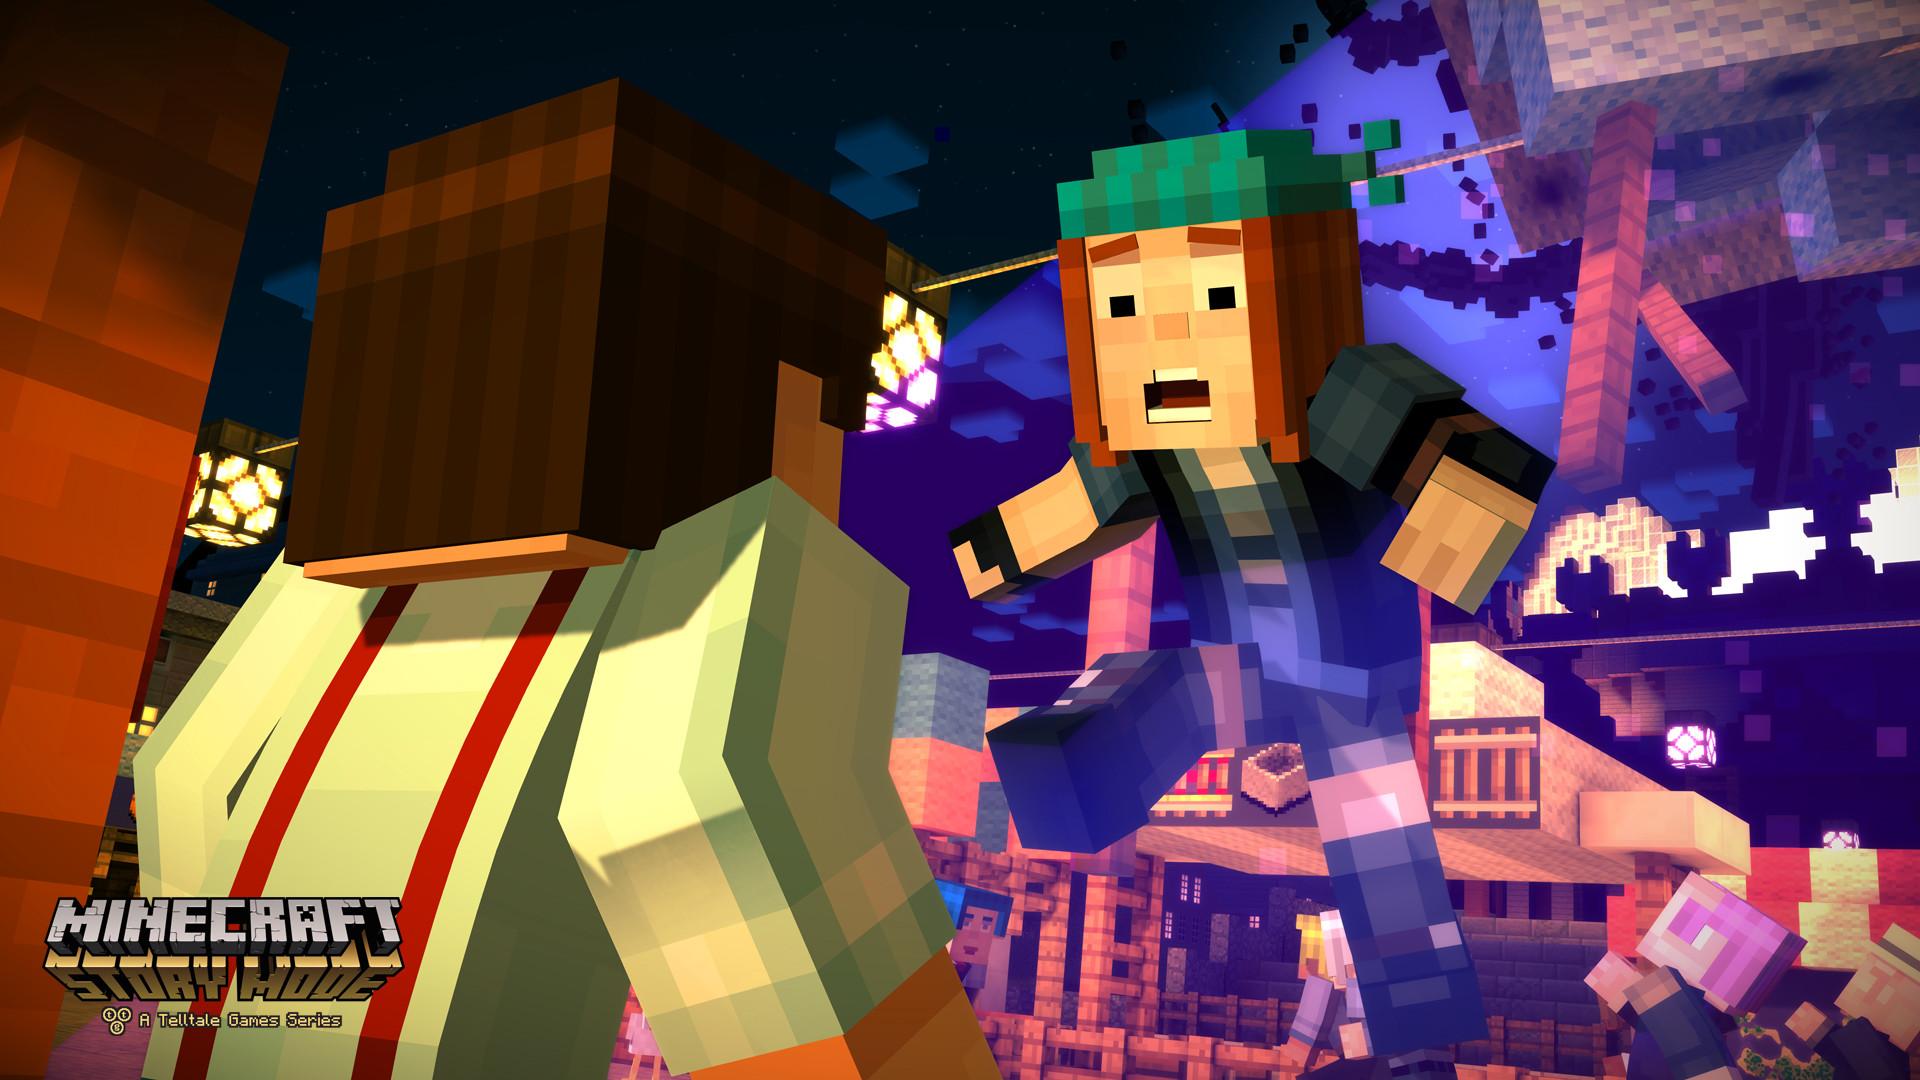 Minecraft:Story Mode - Episode 2 [CODEX] - Full Oyun indir